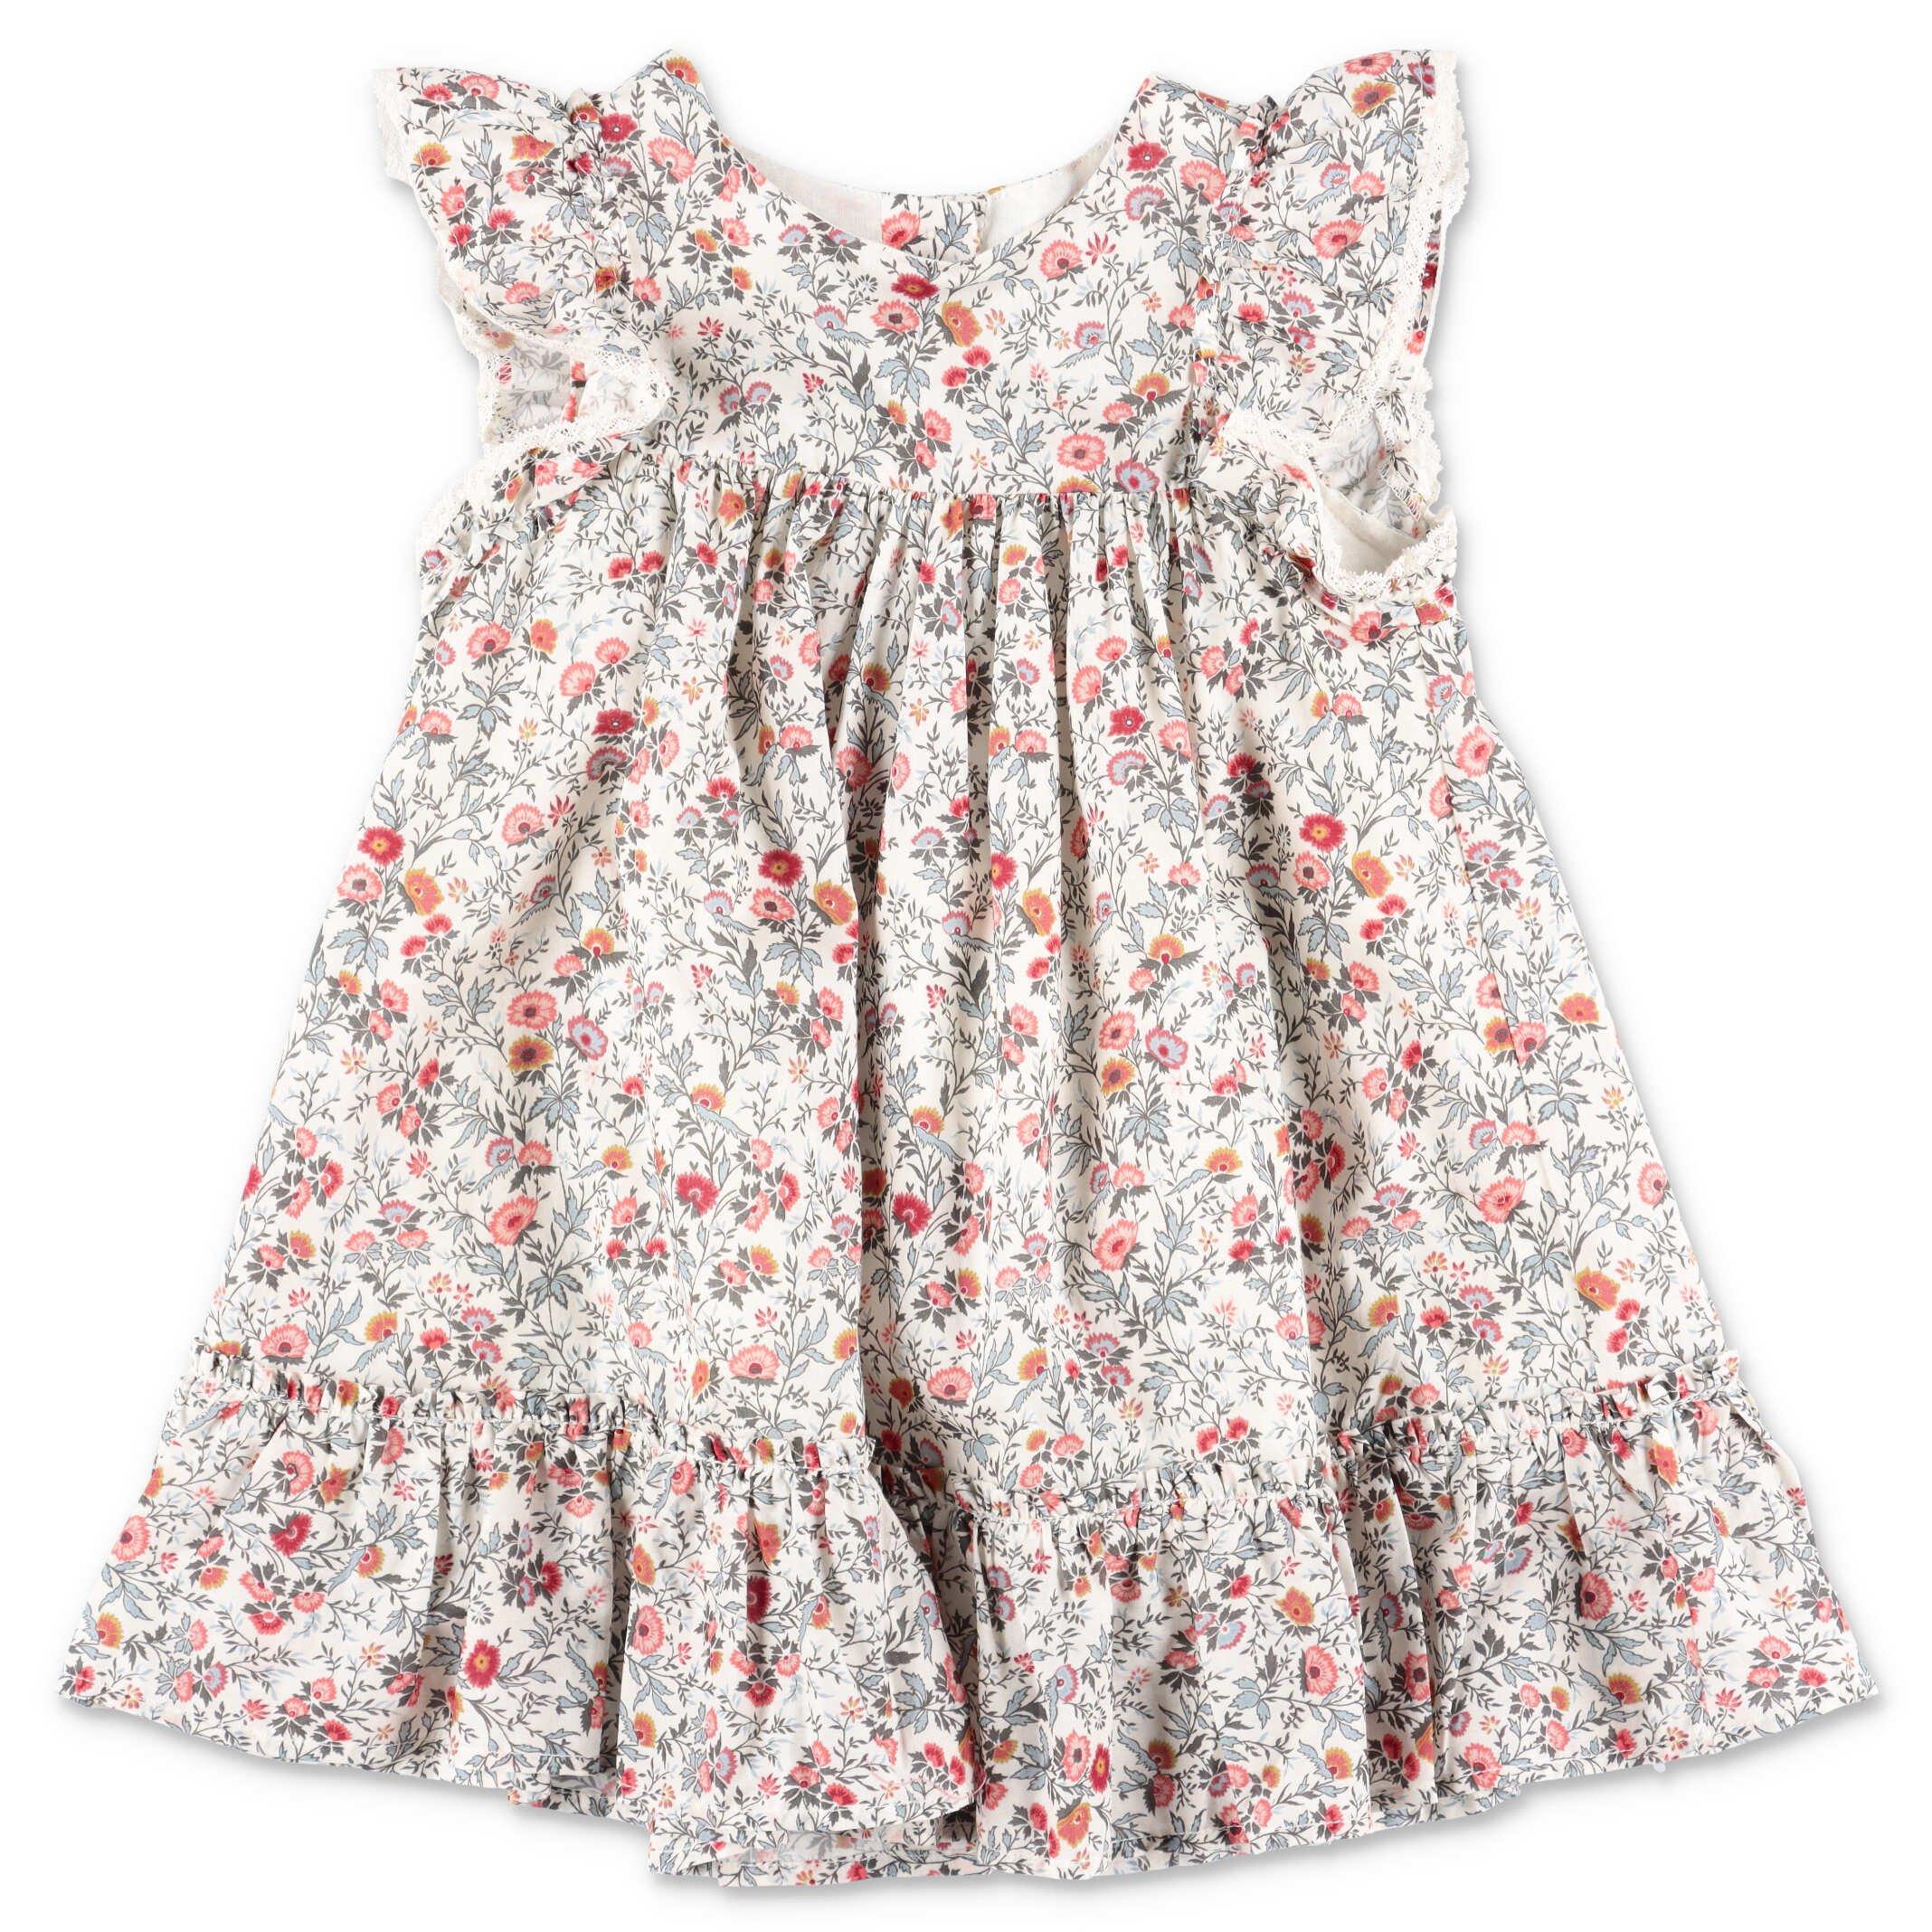 Tartine et Chocolat dress liberty print cotton muslin baby girl